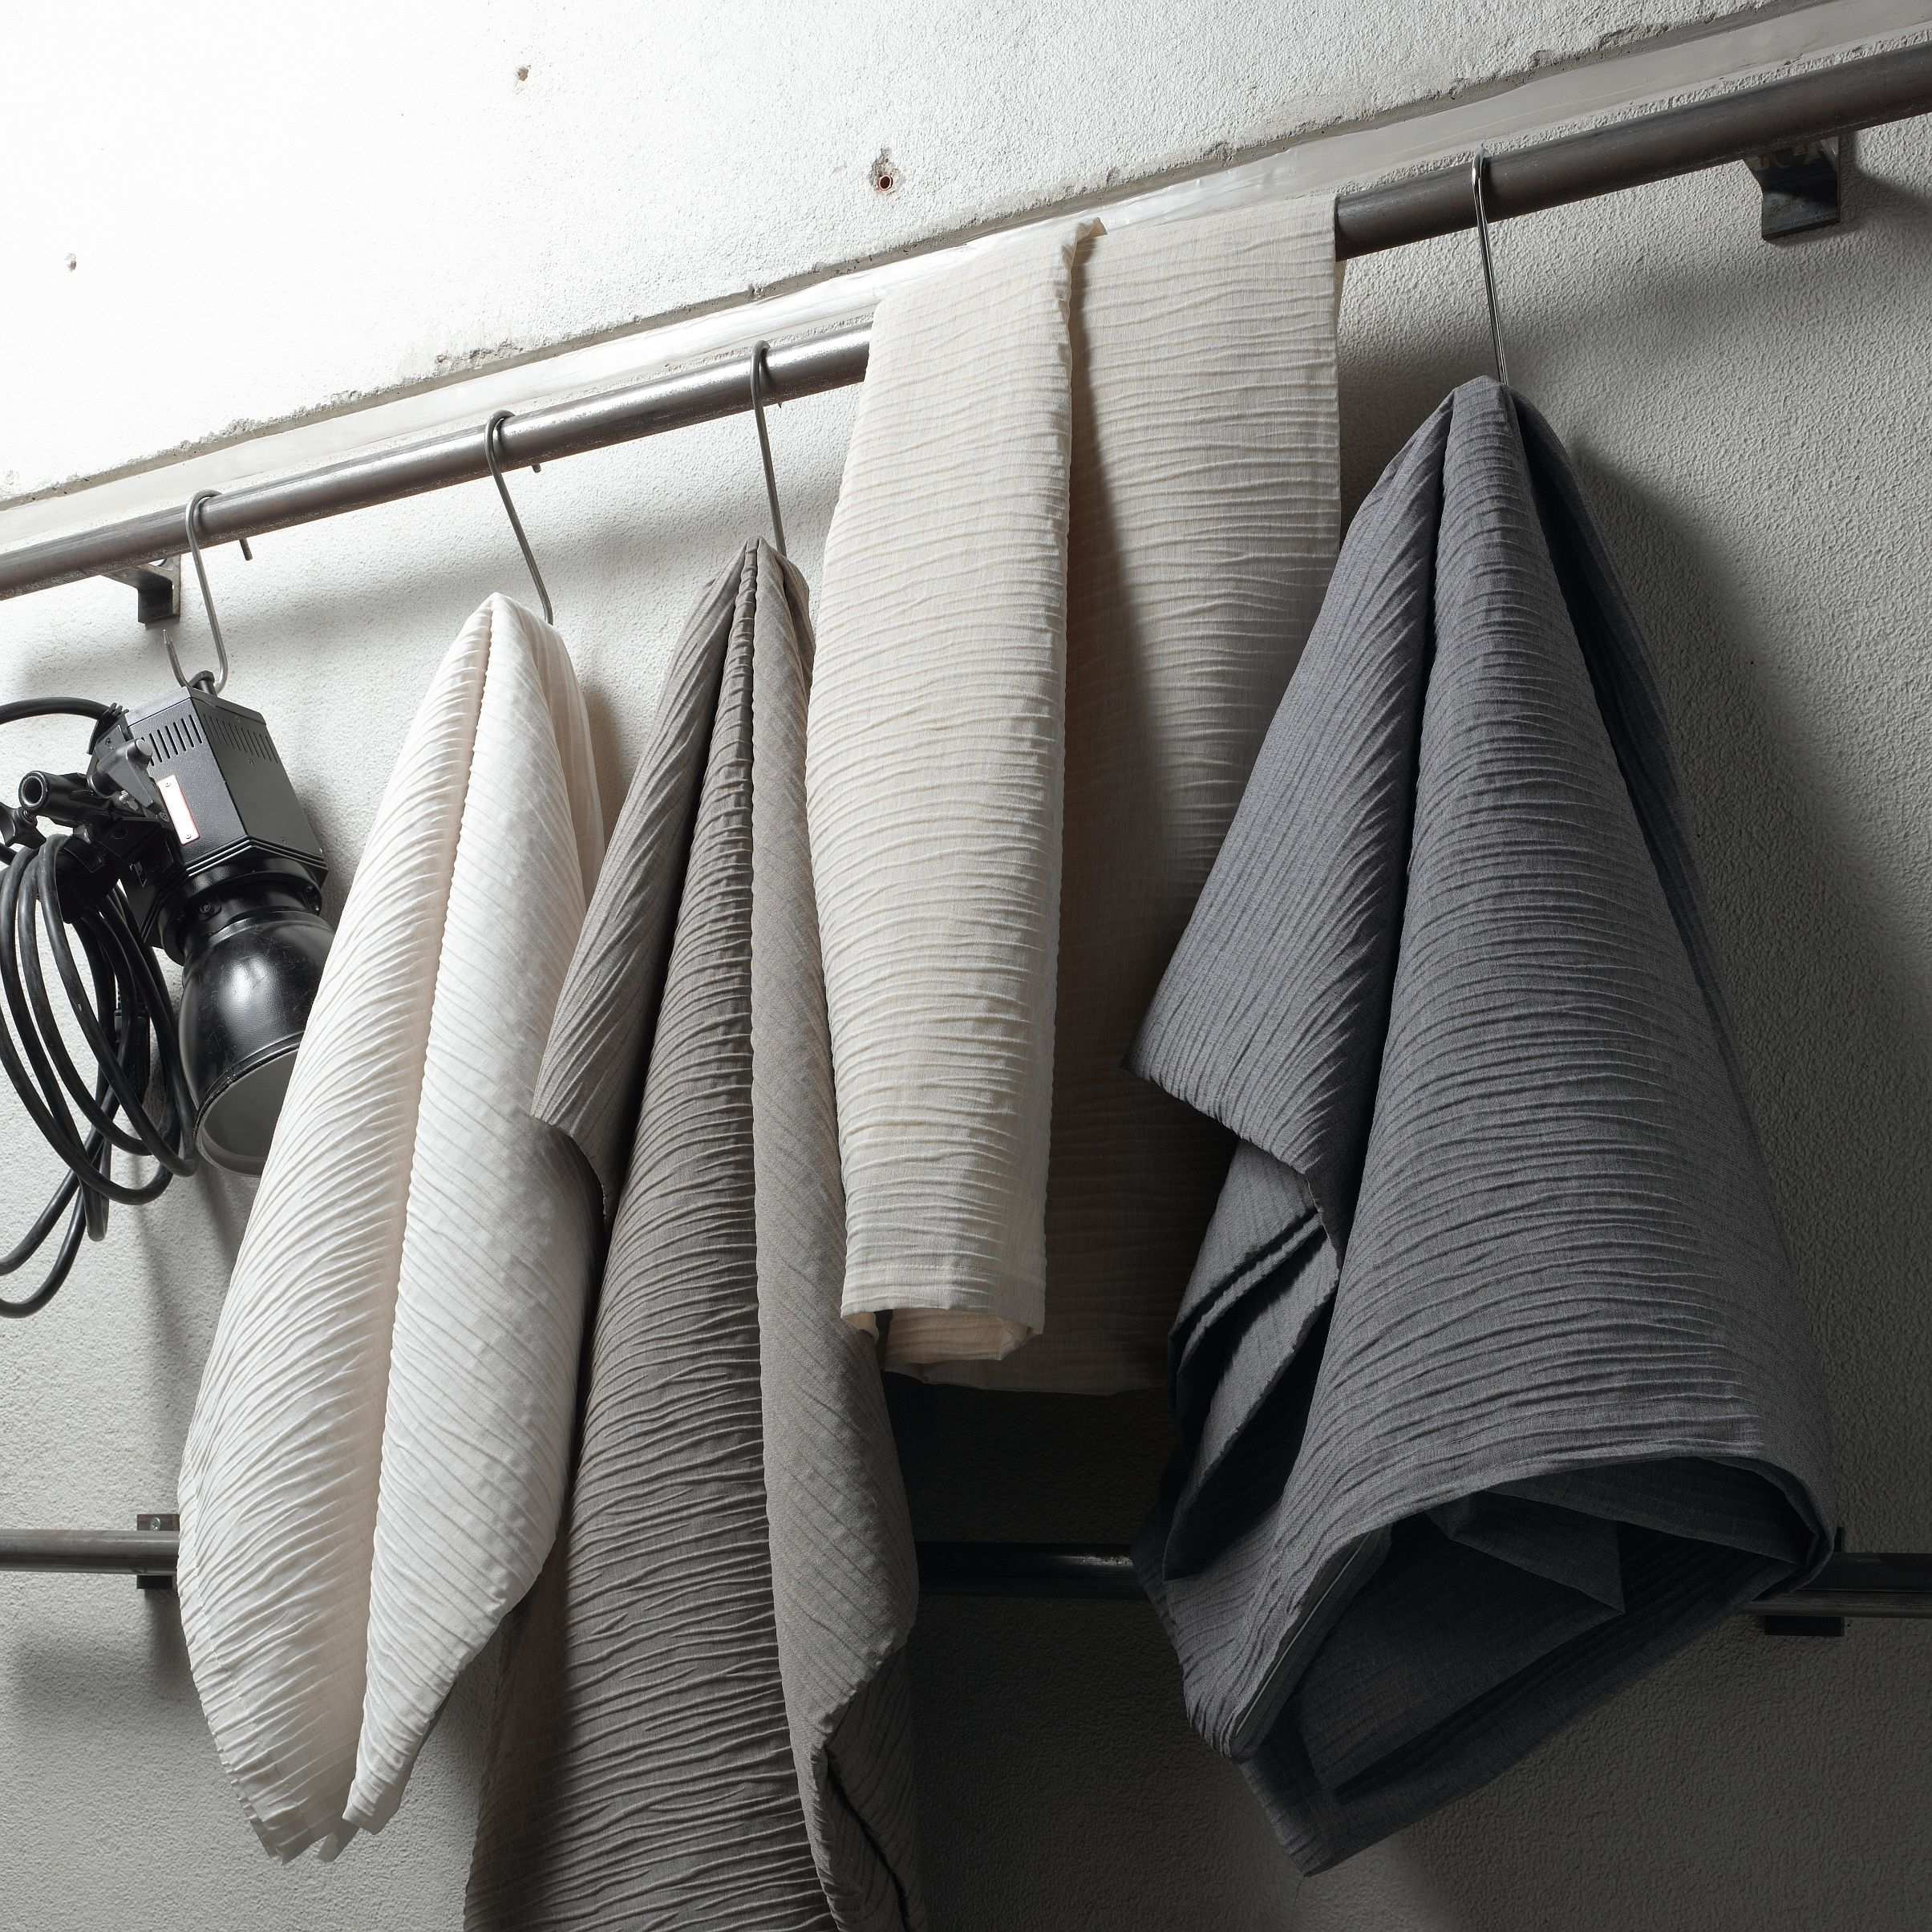 Ado Dessin Mistral Stoff Fabric Curtain Gardine Vorhang Vintage Grau Grey Fabric Design Drapes Curtains Classic Collection